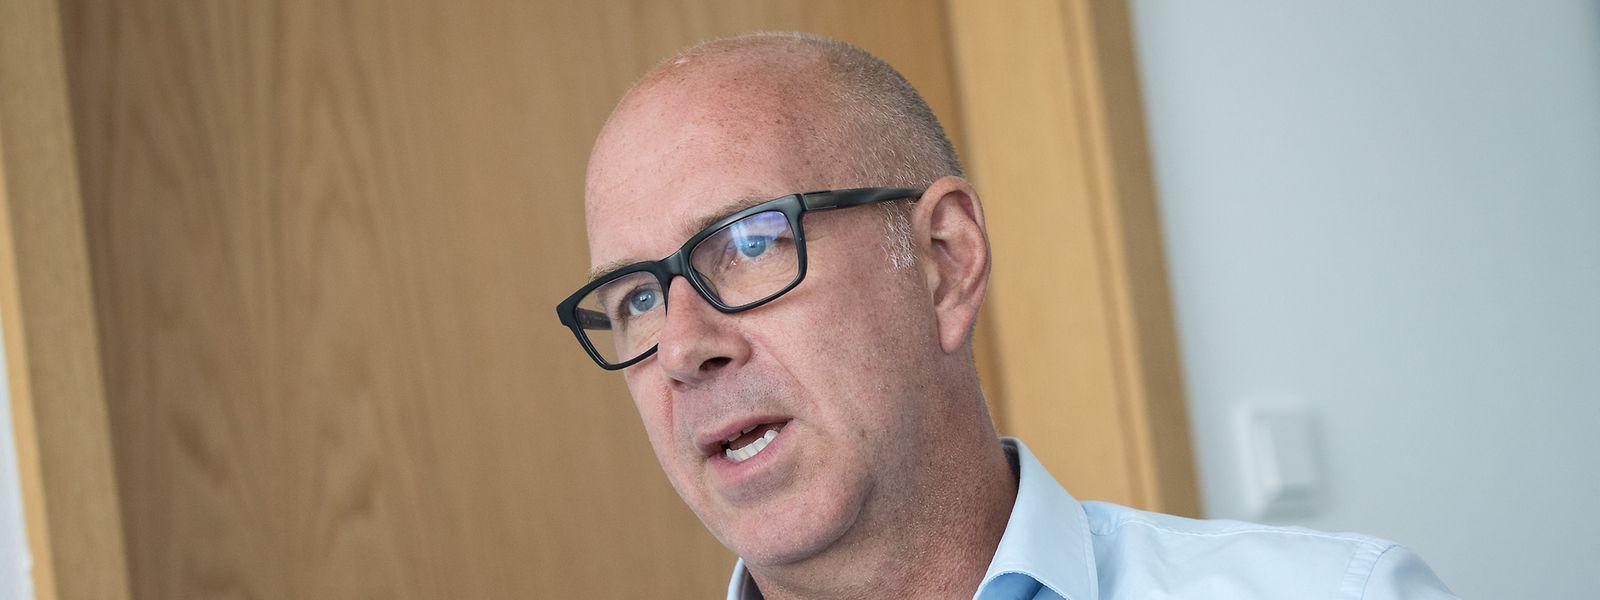 Raymond Conzemius ist aktuell noch Direktor des Sportlycée.